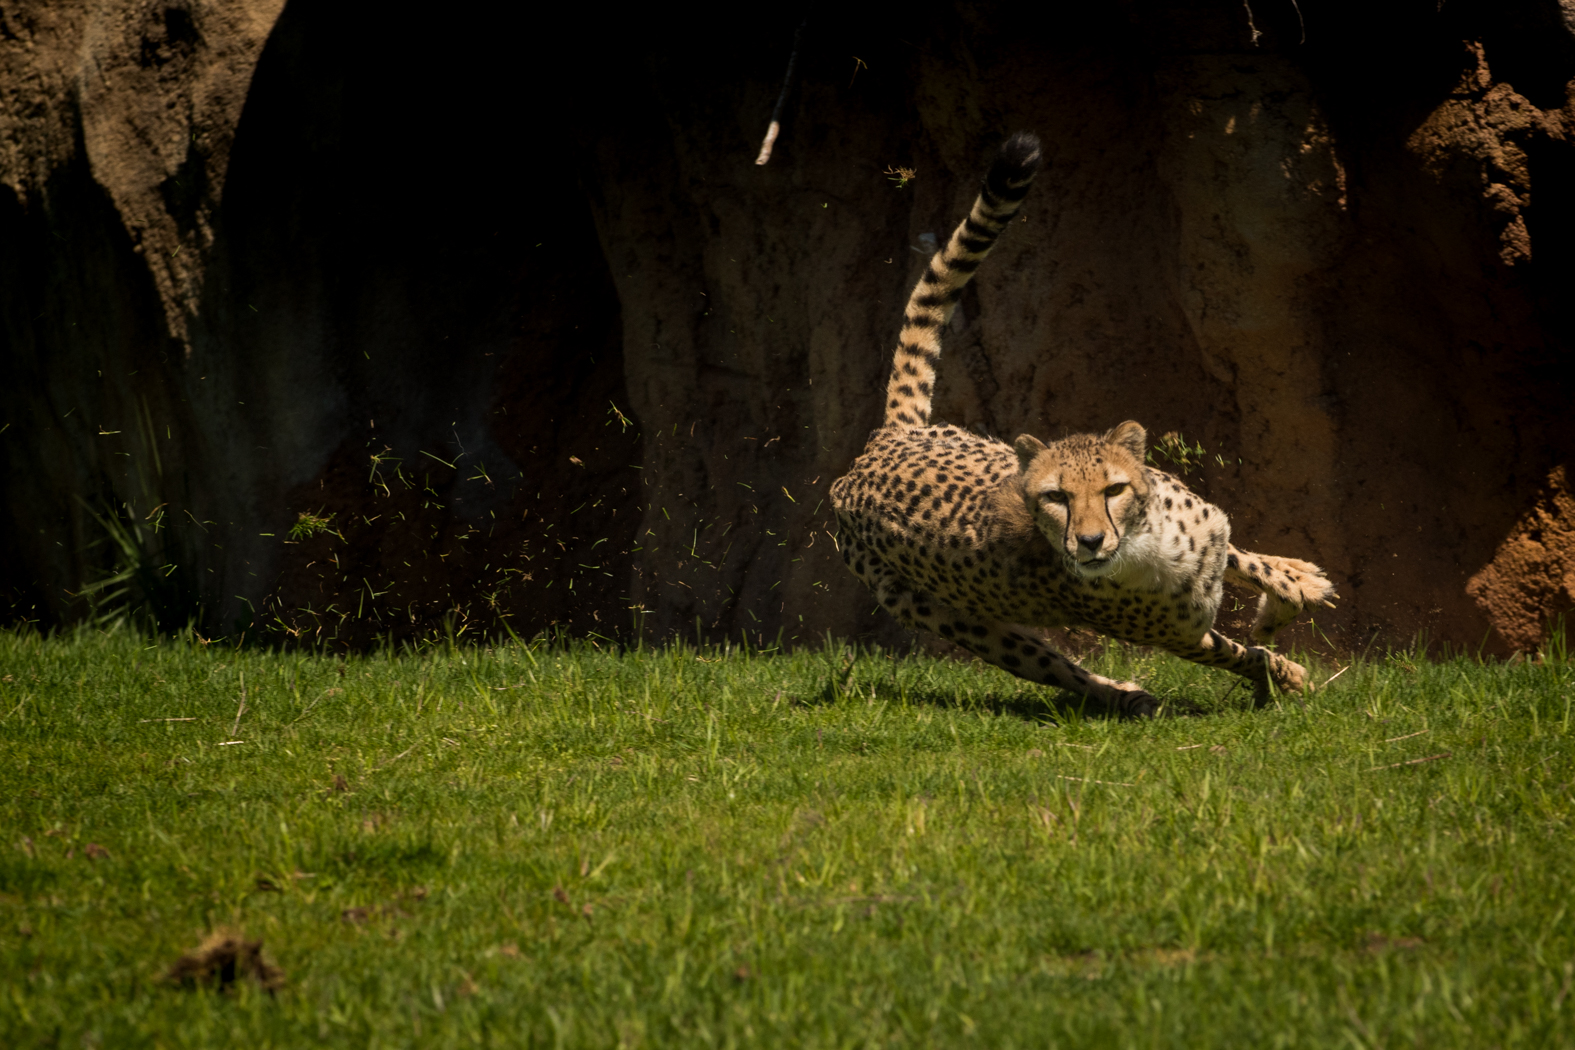 Cheetah Run 2432 - Grahm S. Jones, Columbus Zoo and Aquarium